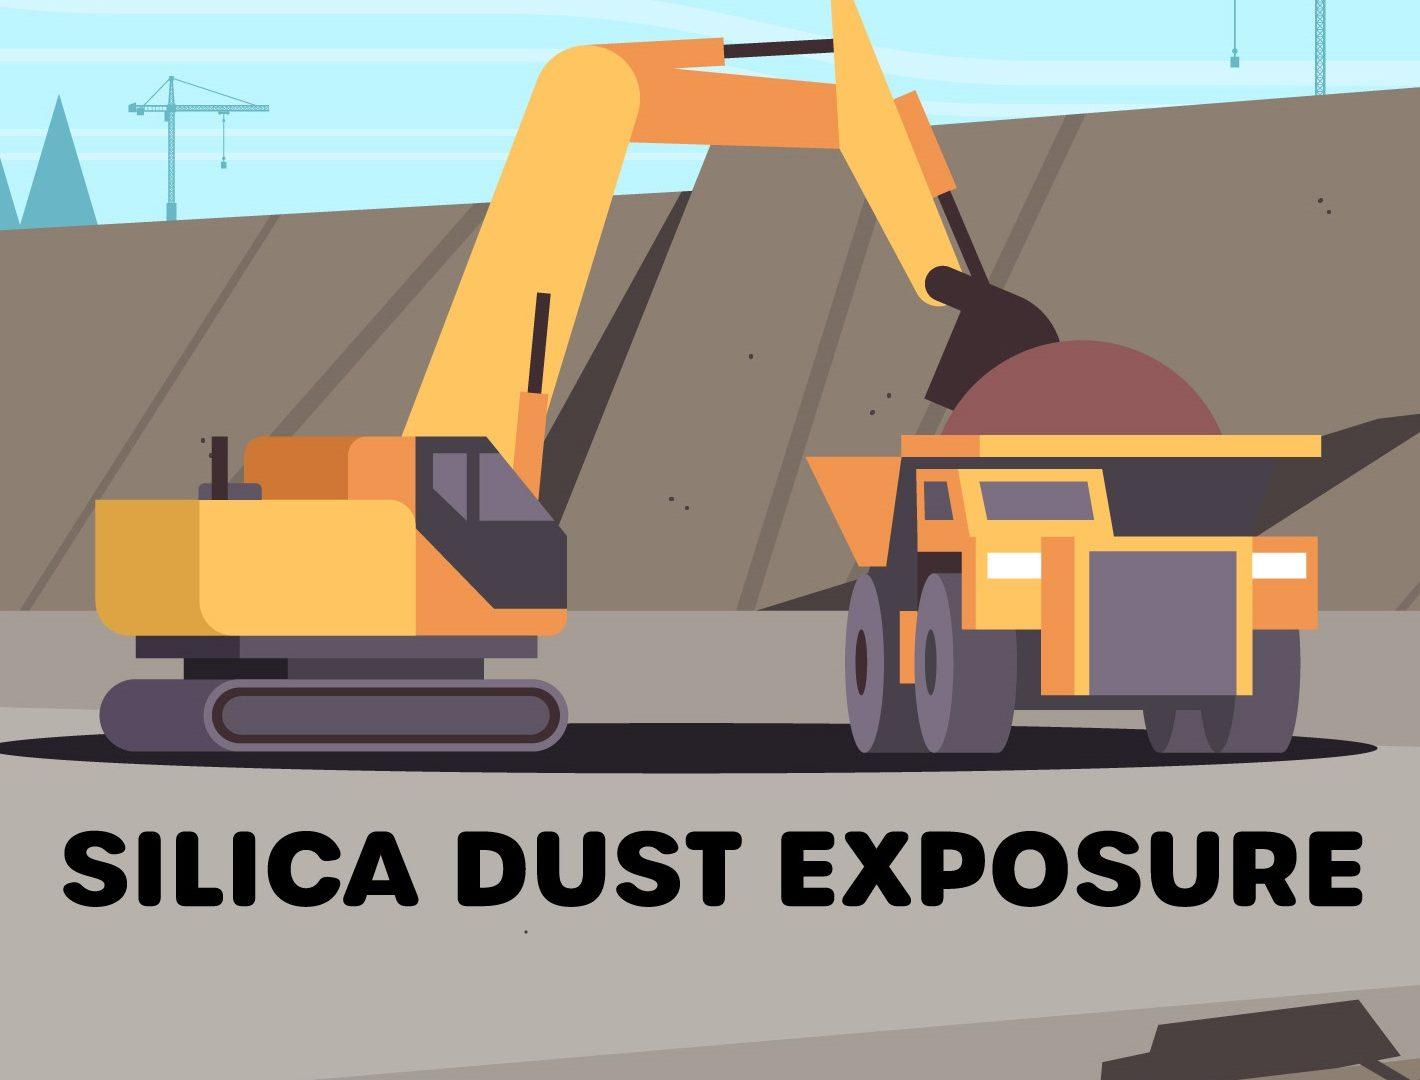 Silica Dust Exposure & Silica Dust Monitoring